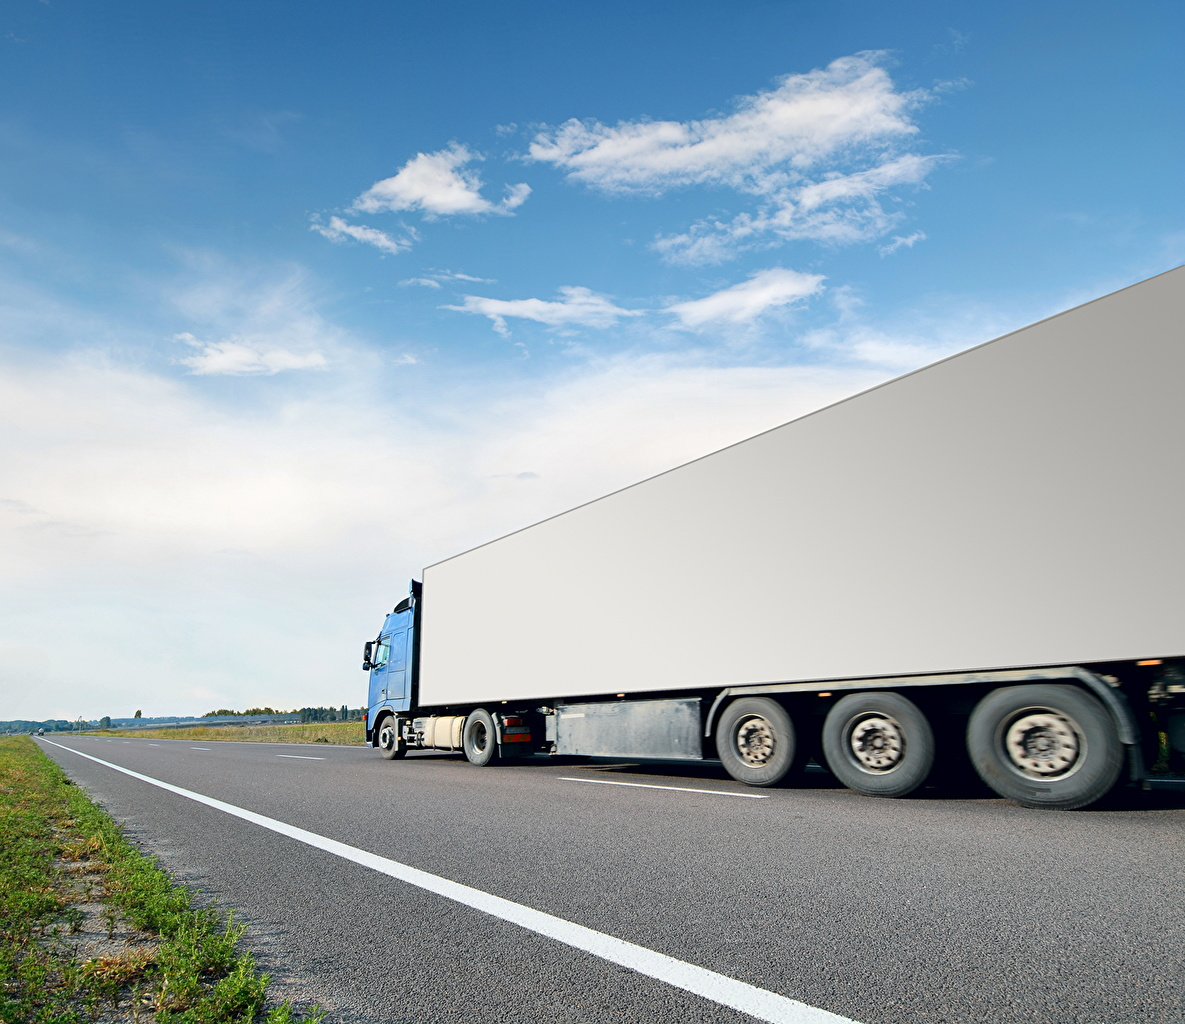 Desktop Wallpapers Trucks Sky Roads auto lorry Cars automobile